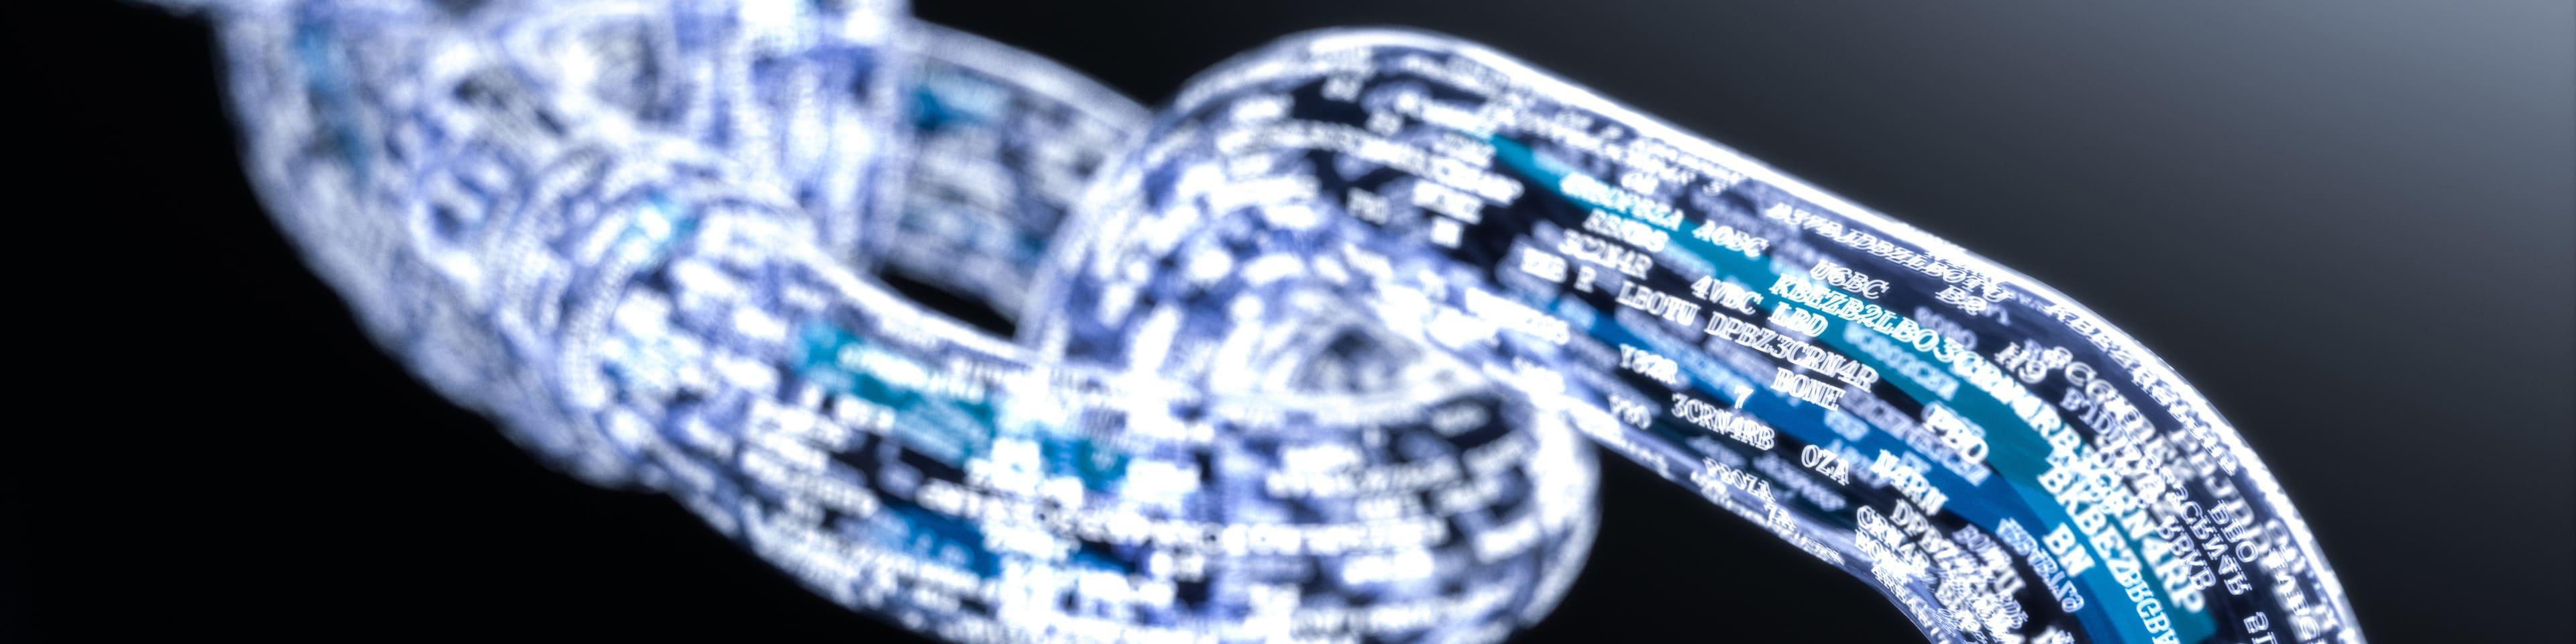 Digitale dataketting visualisatie van blockchain